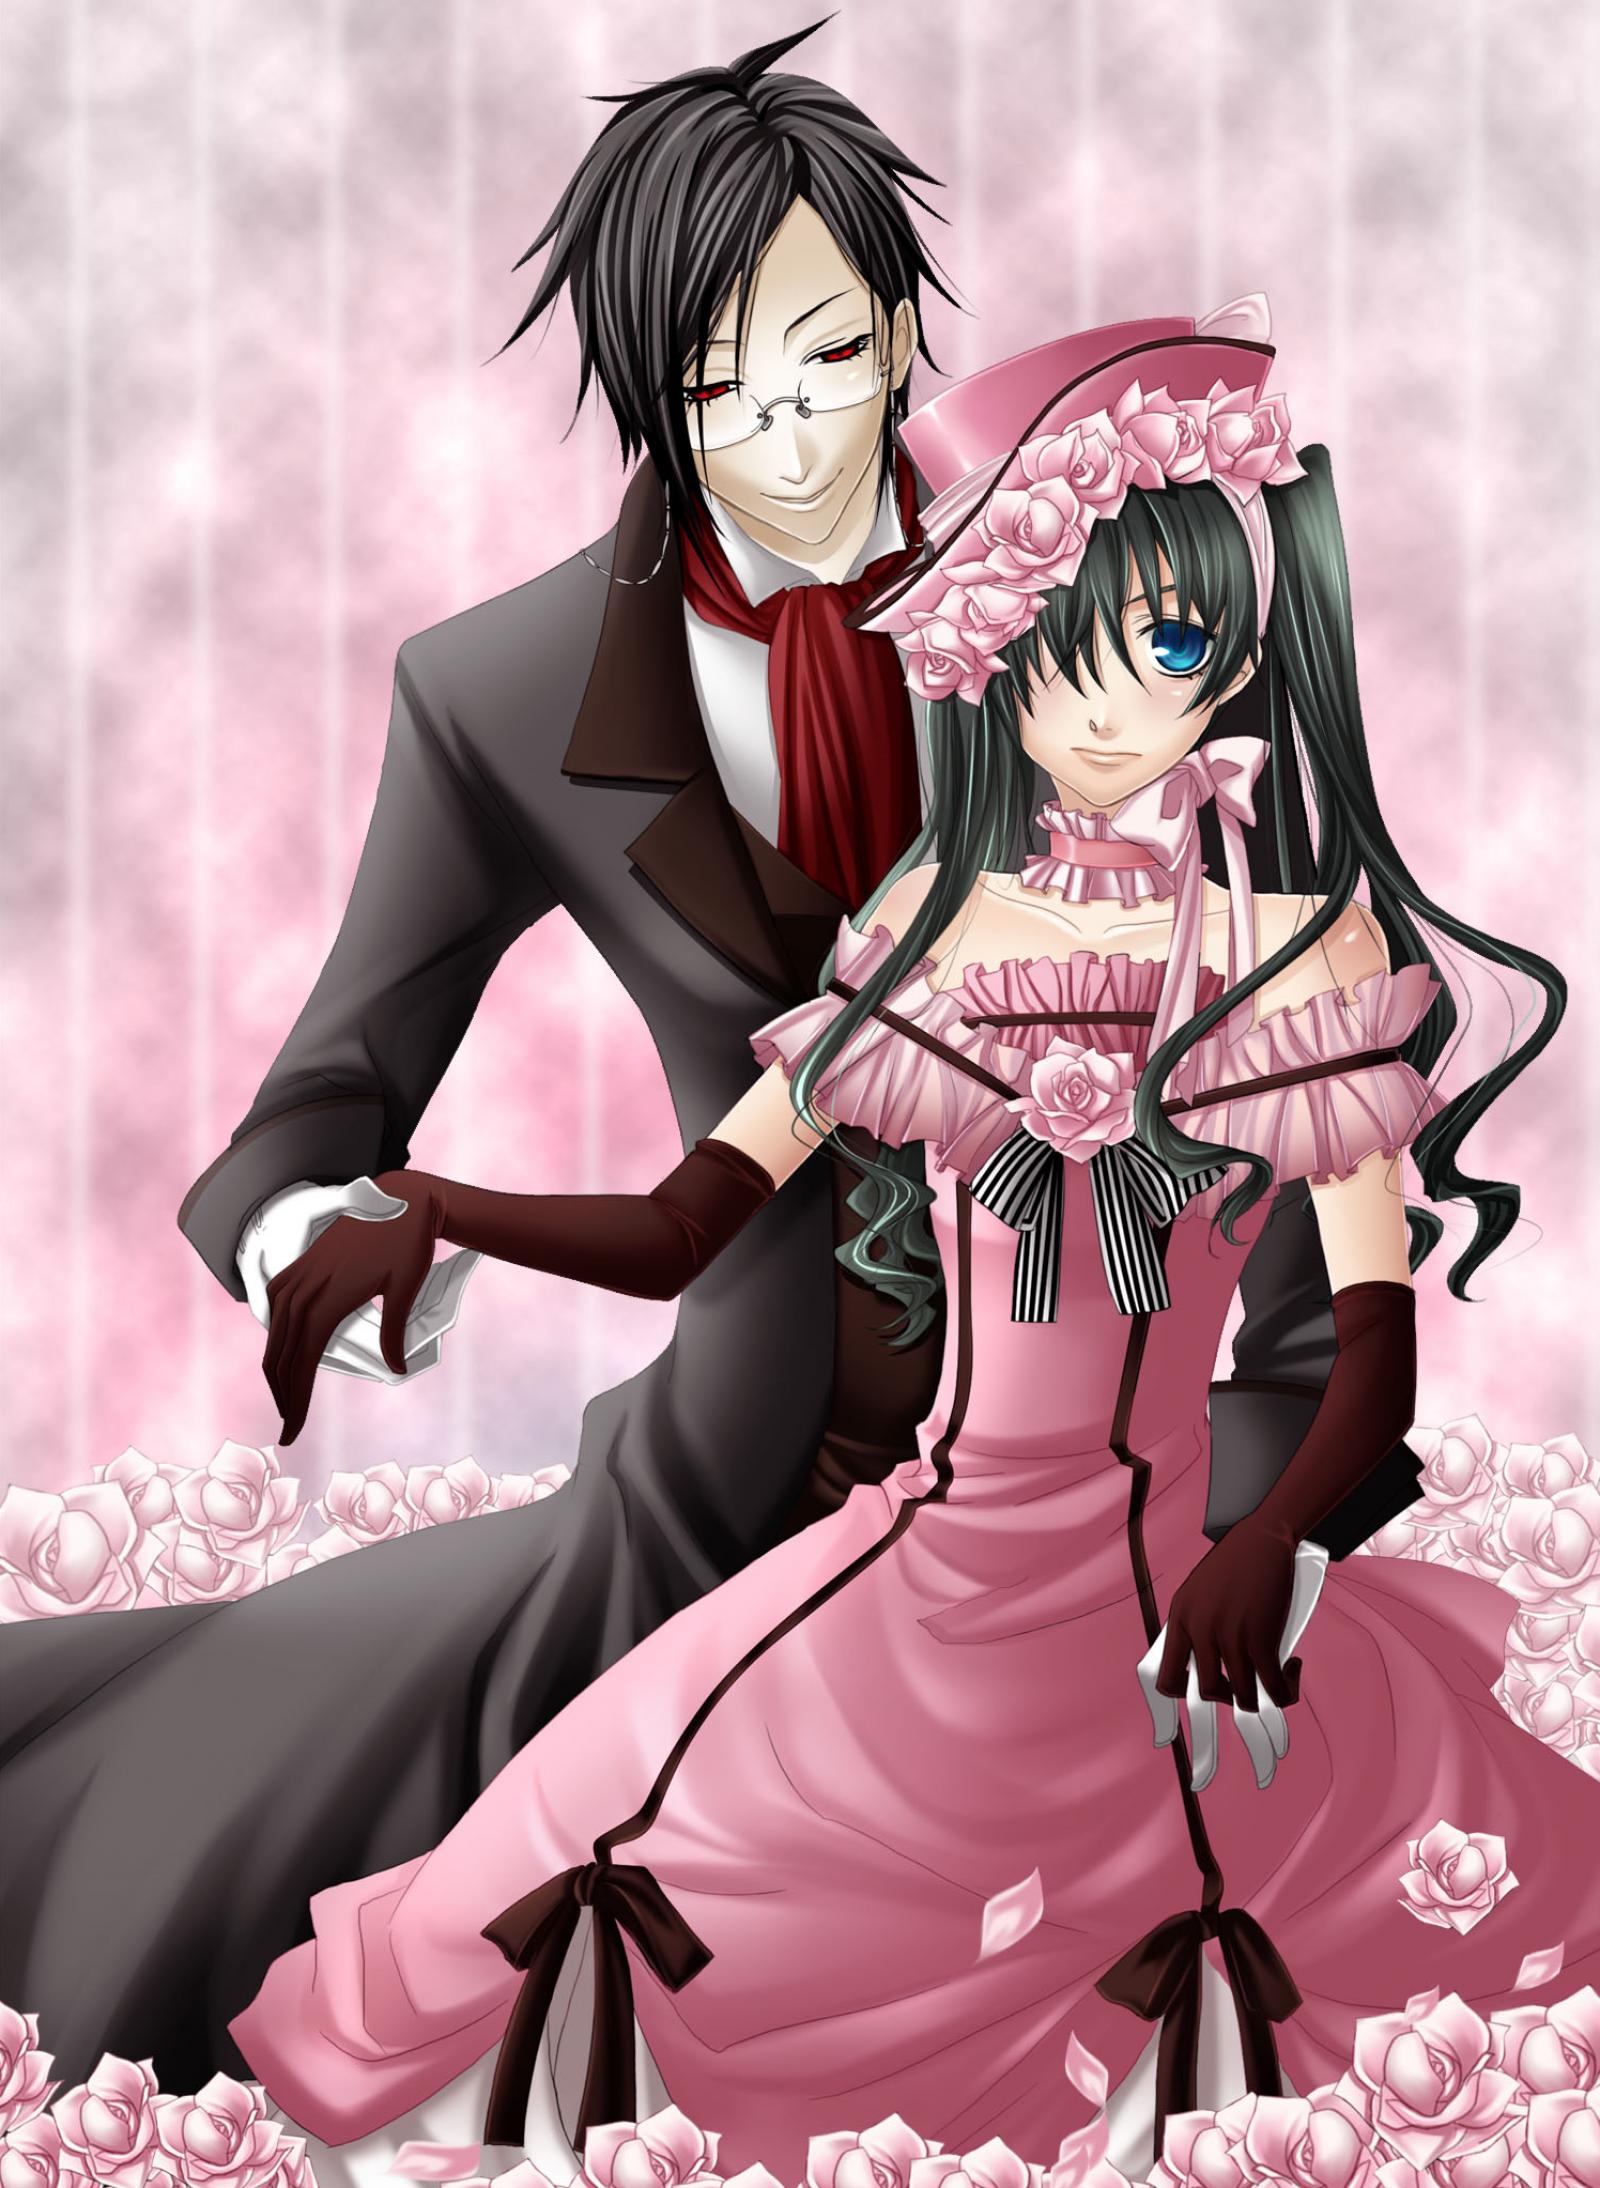 kuroshitsuji sebastian and ciel relationship